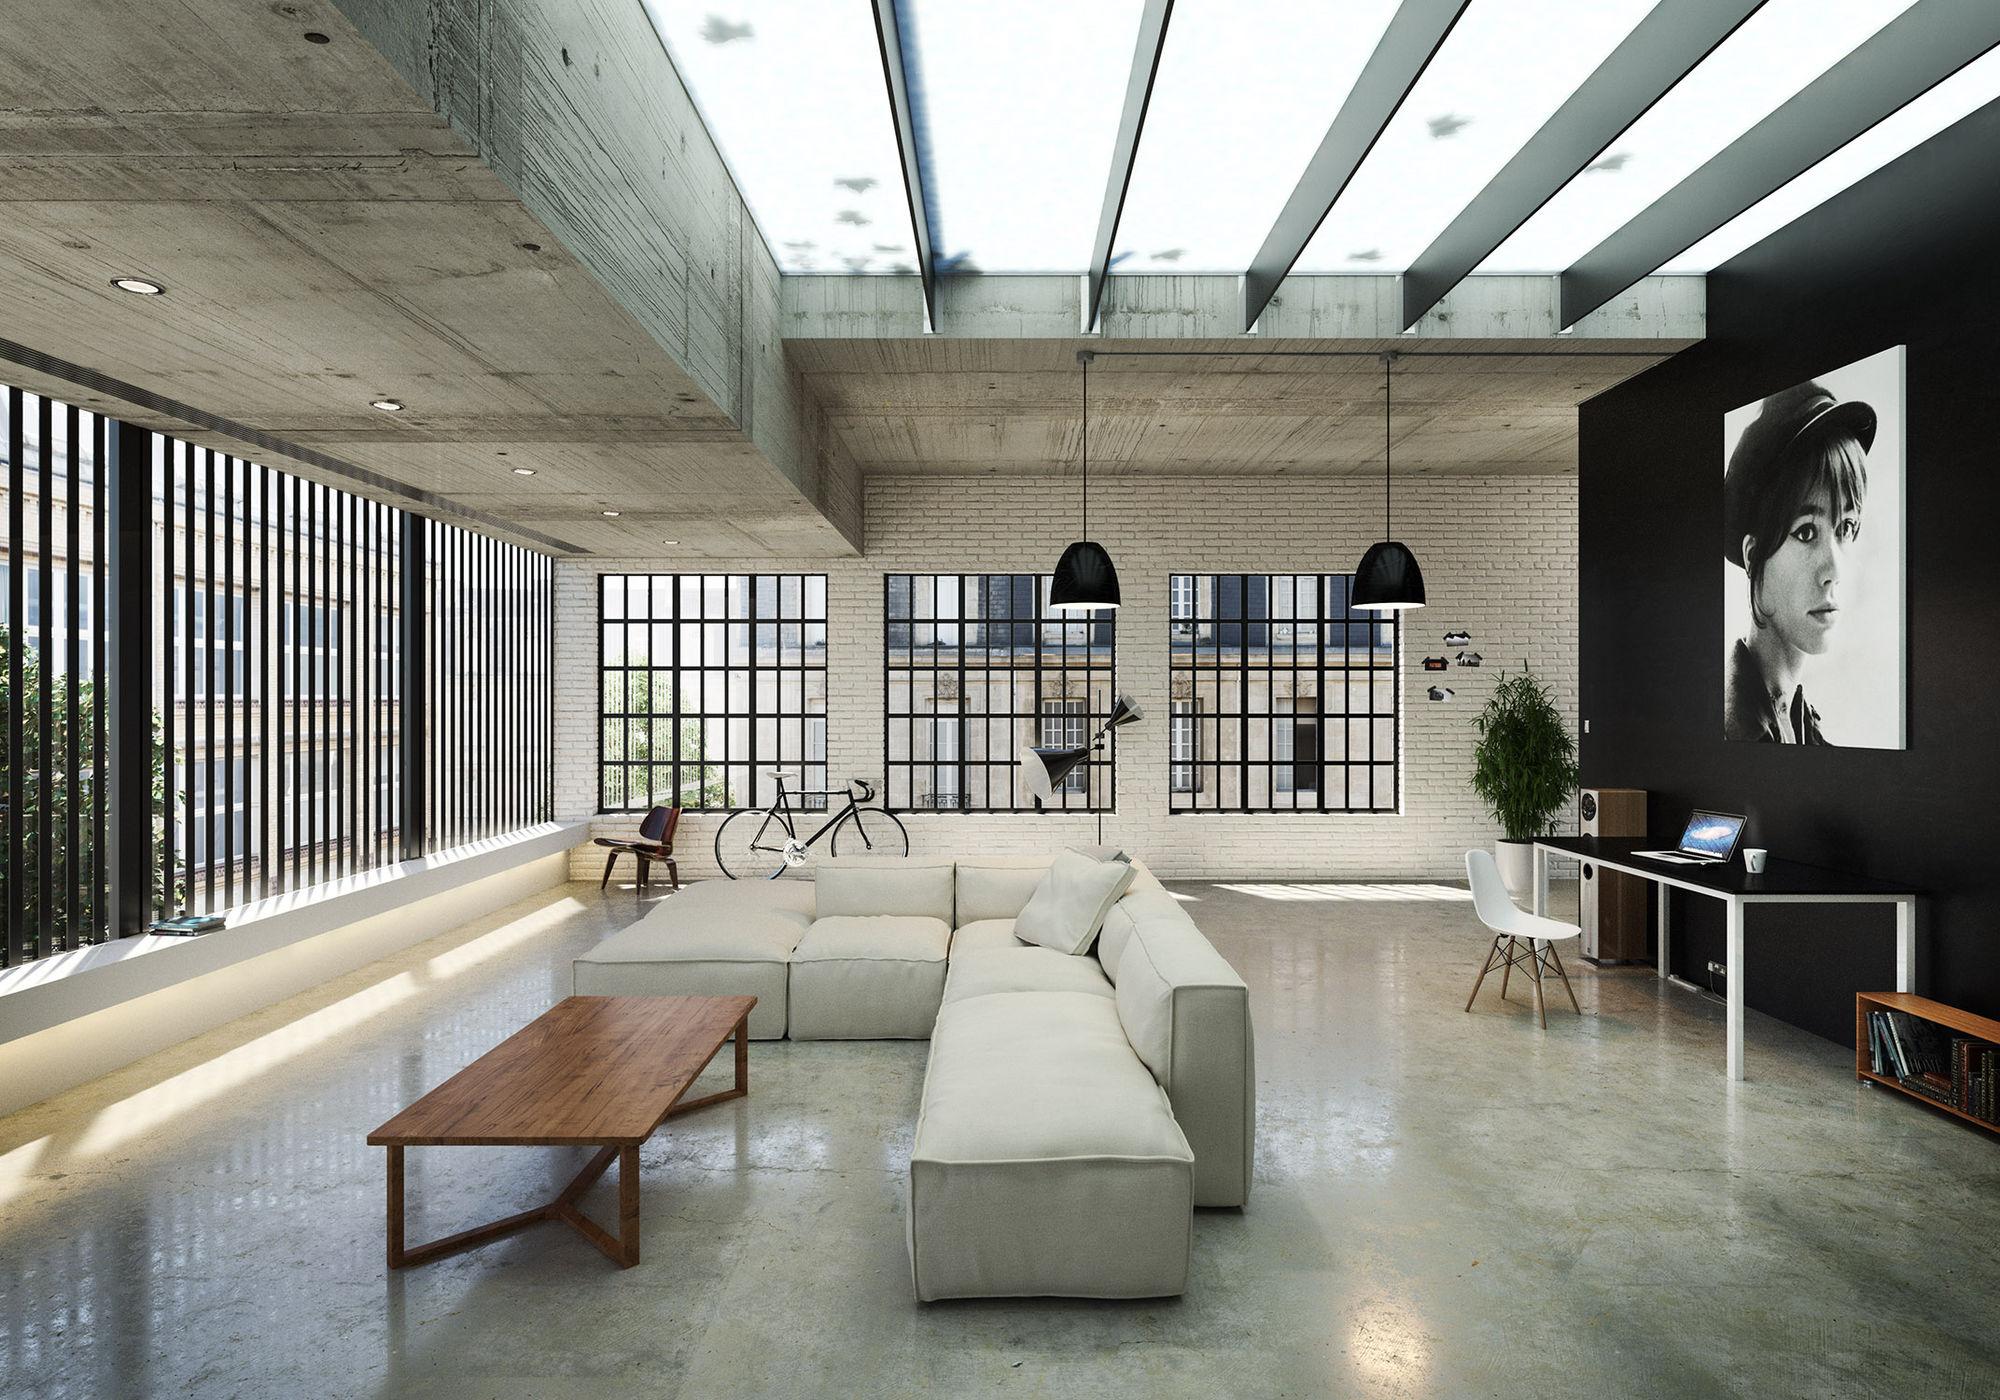 Монохромный лофт дизайн квартиры студии